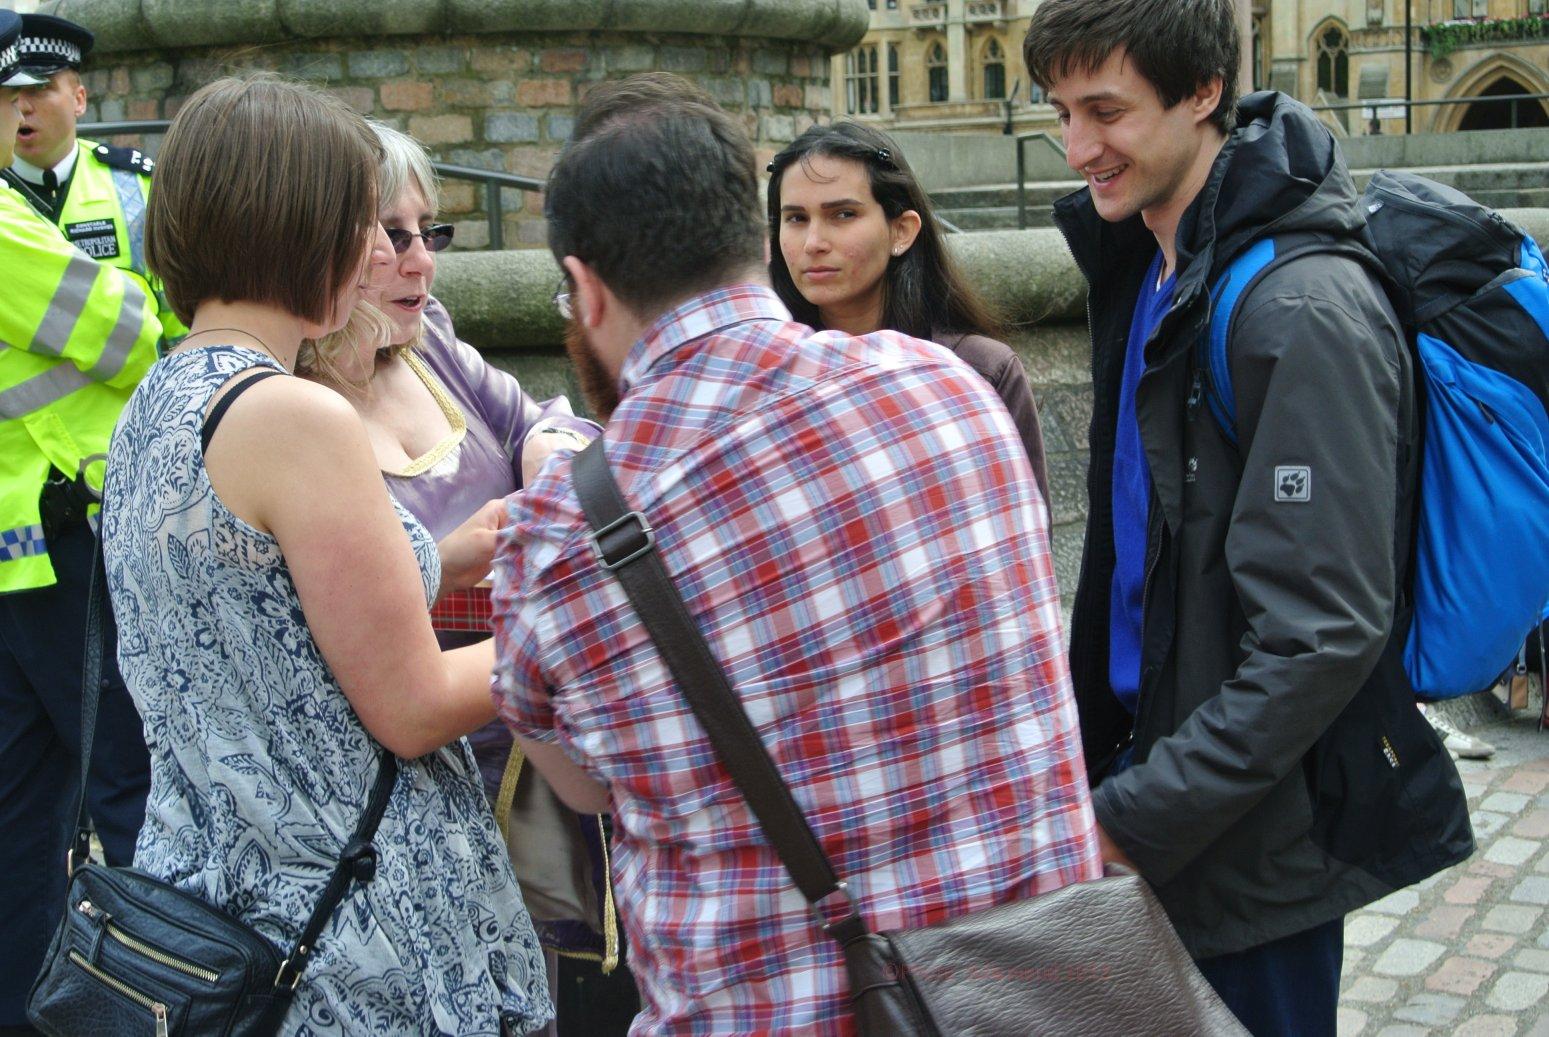 Explaining the clues